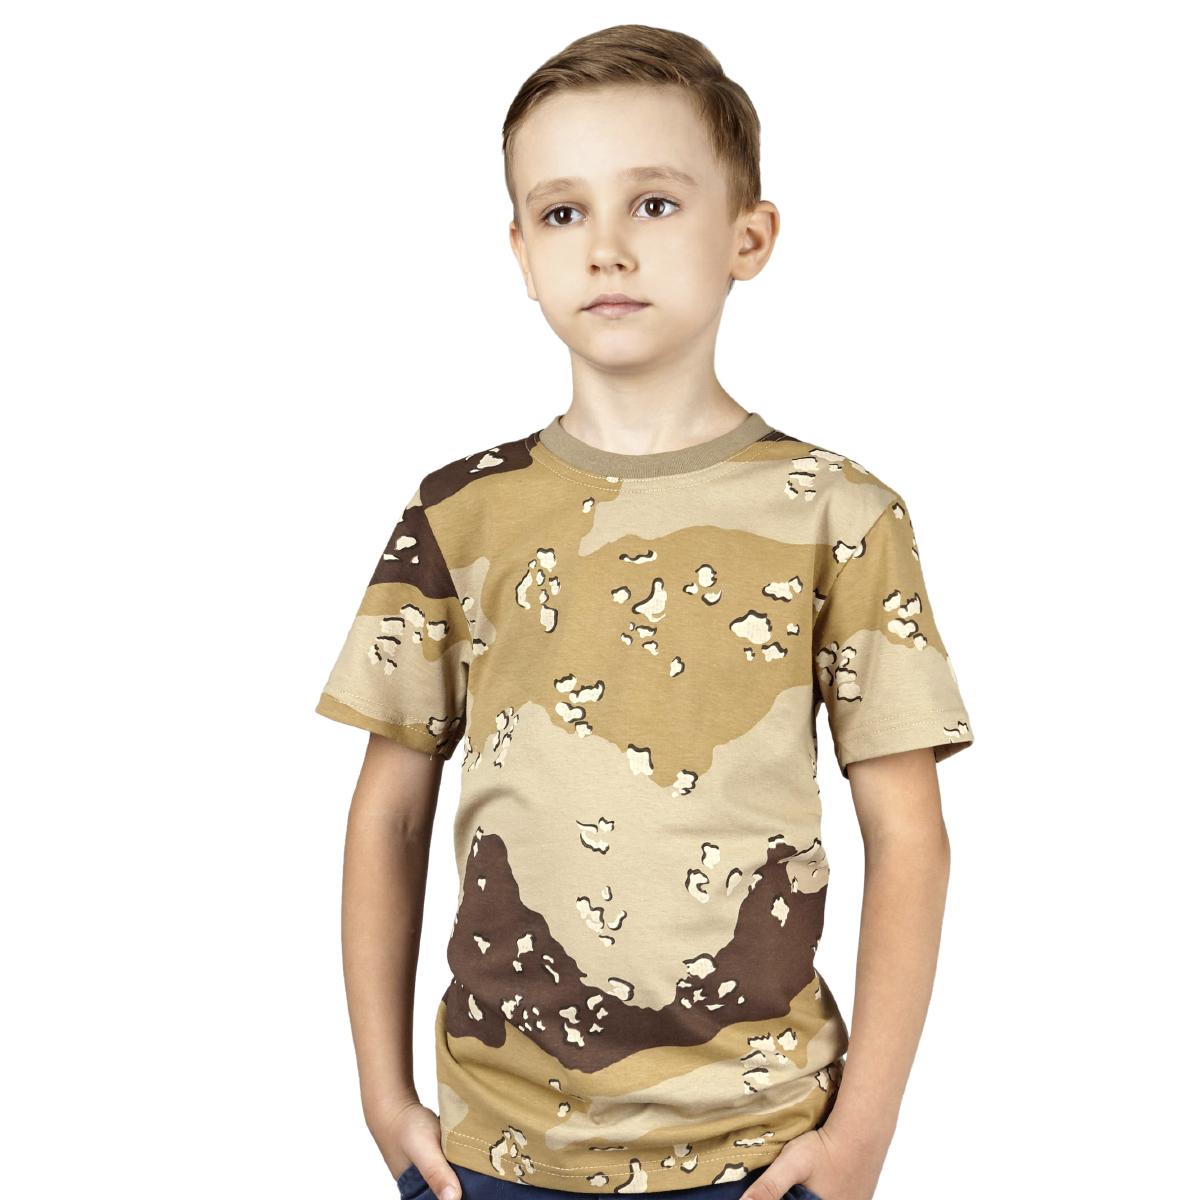 Детская футболка камуфляжная (пустыня)